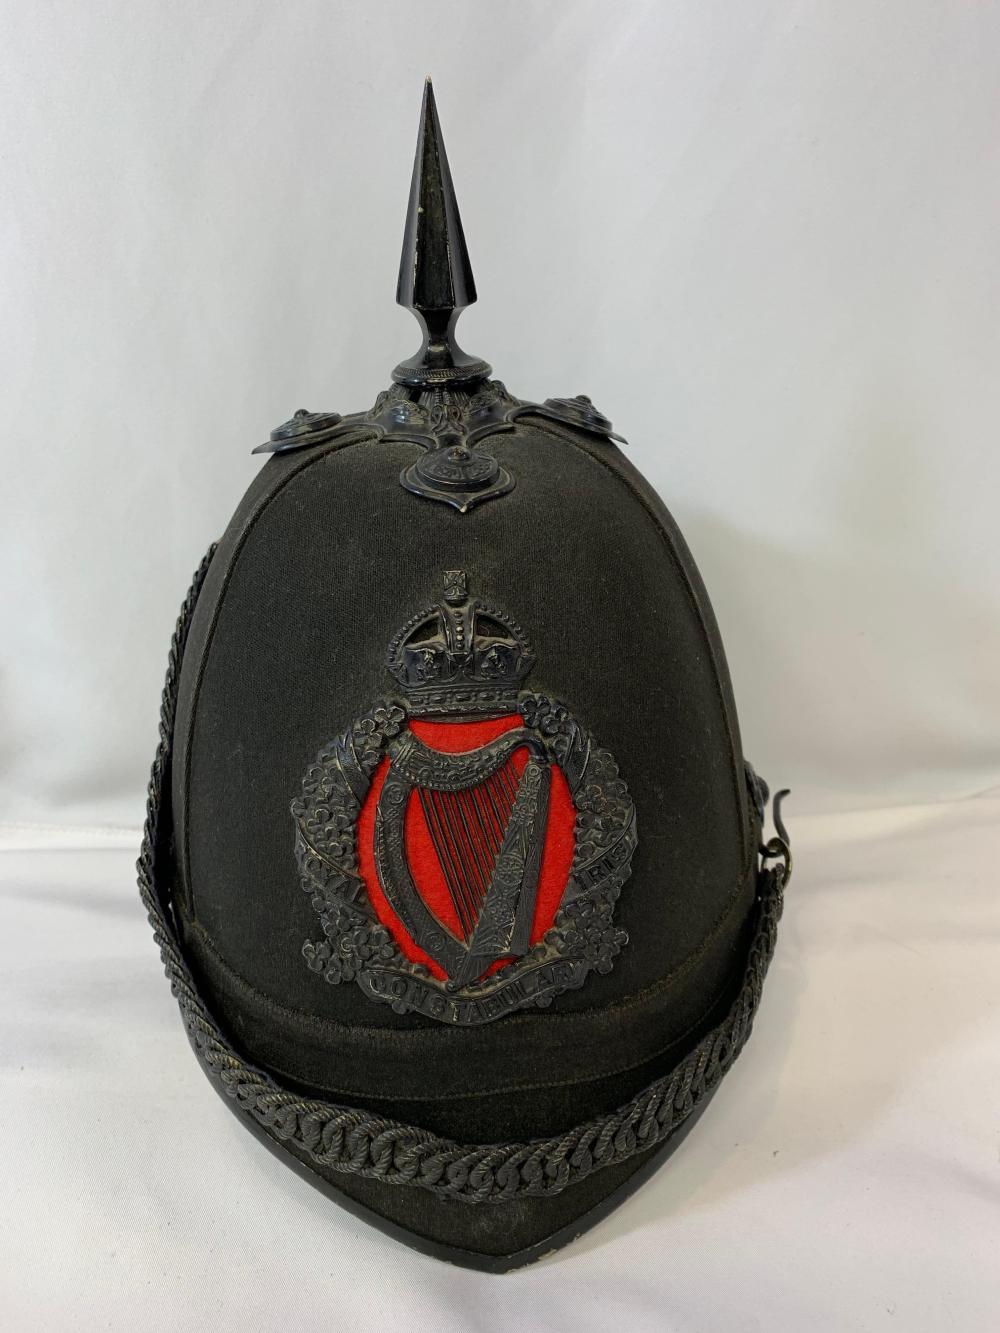 Scarce Royal Irish Constabulary Helmet